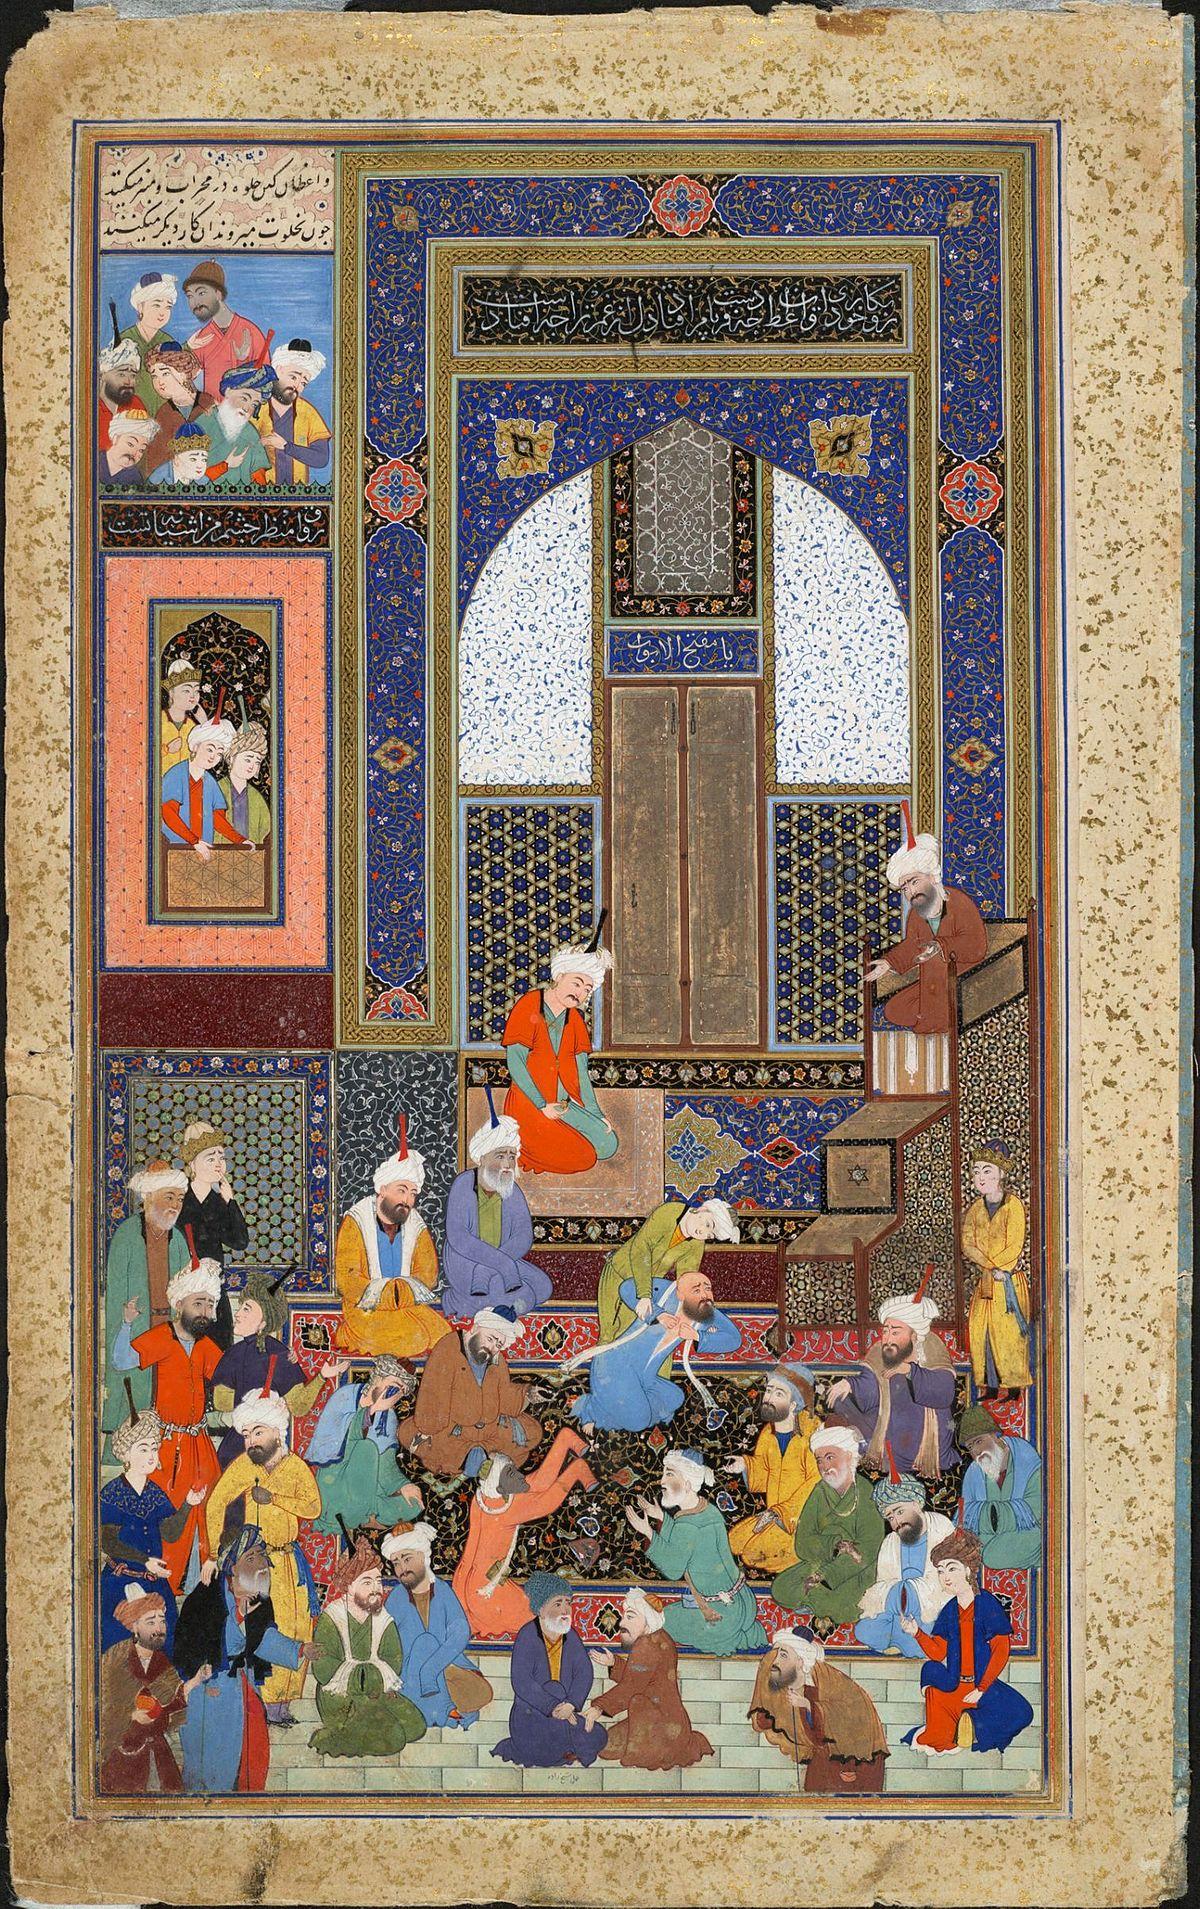 Sheikhzadeh wikip dia for Divan e hafez